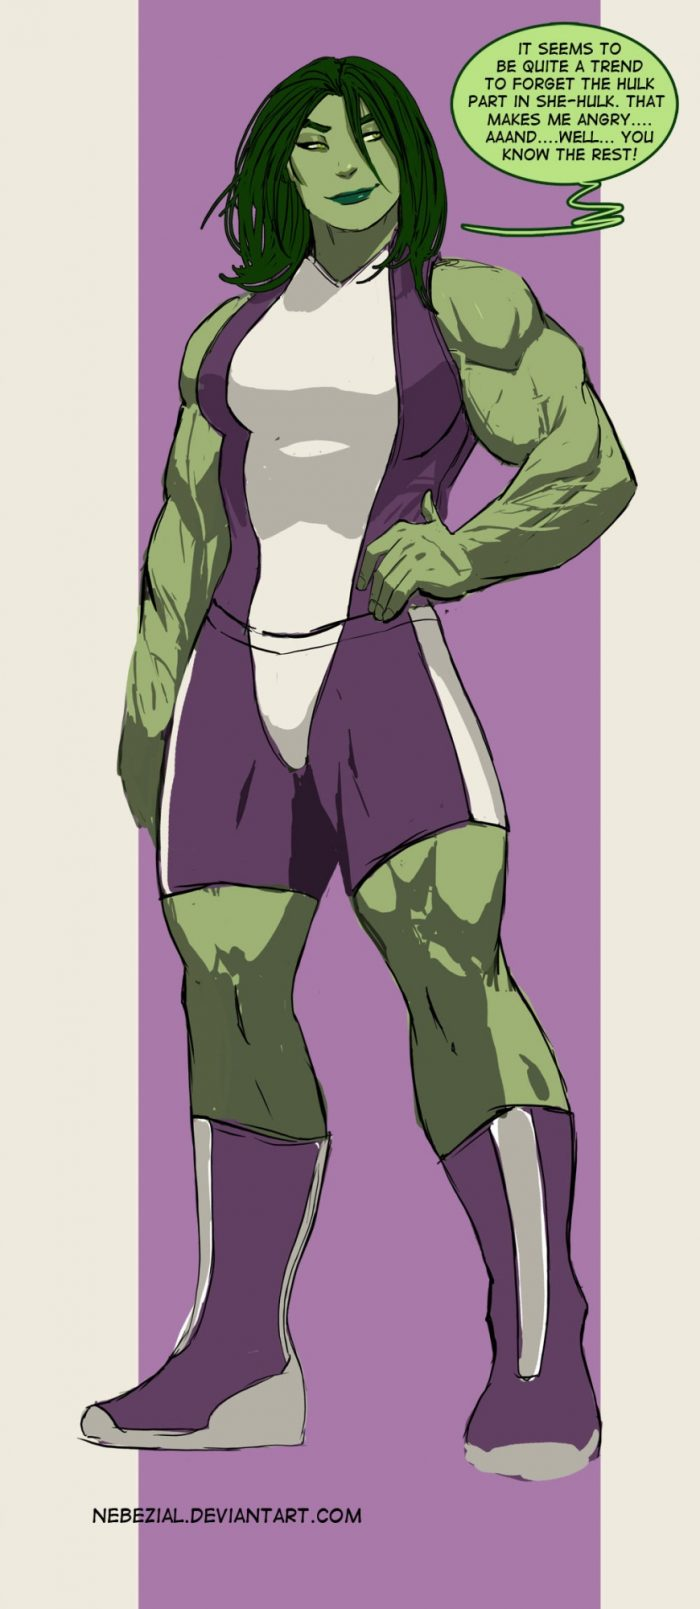 She Hulk is trendy.jpg